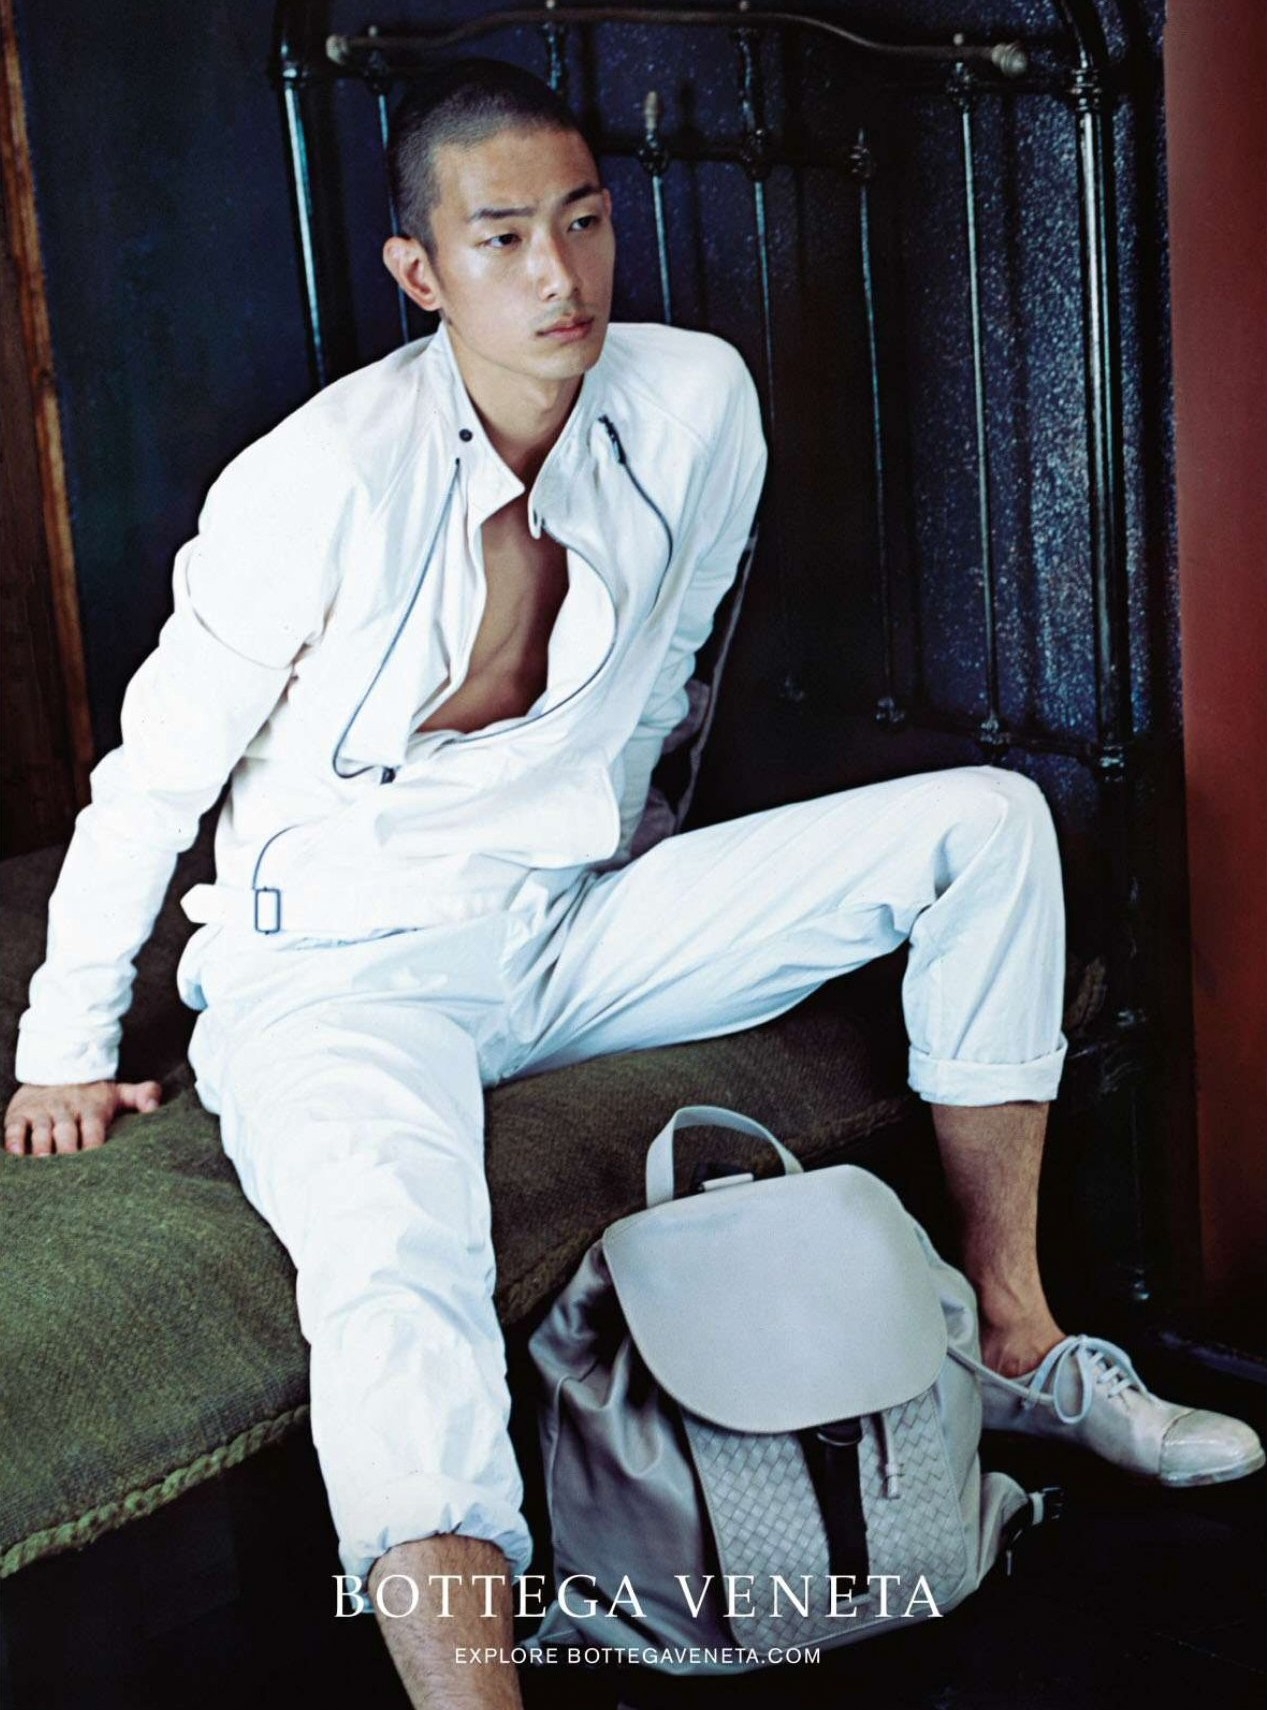 Sung Jin Park is White Hot in Latest Bottega Veneta Spring 2015 Ad Photo